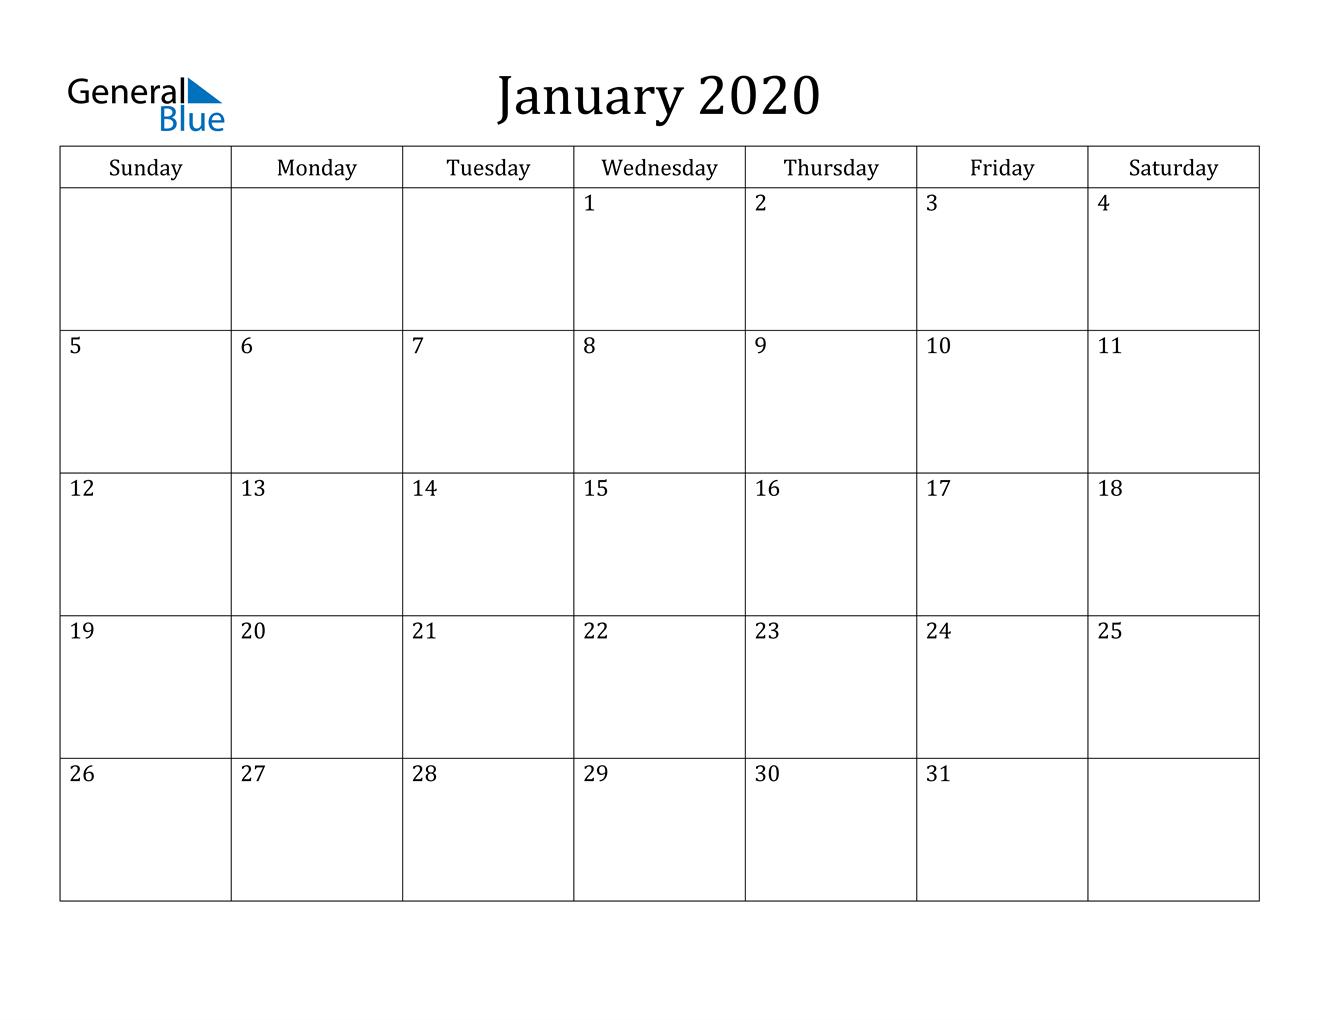 January 2020 Calendar - Pdf Word Excel throughout January 2020 Calendar